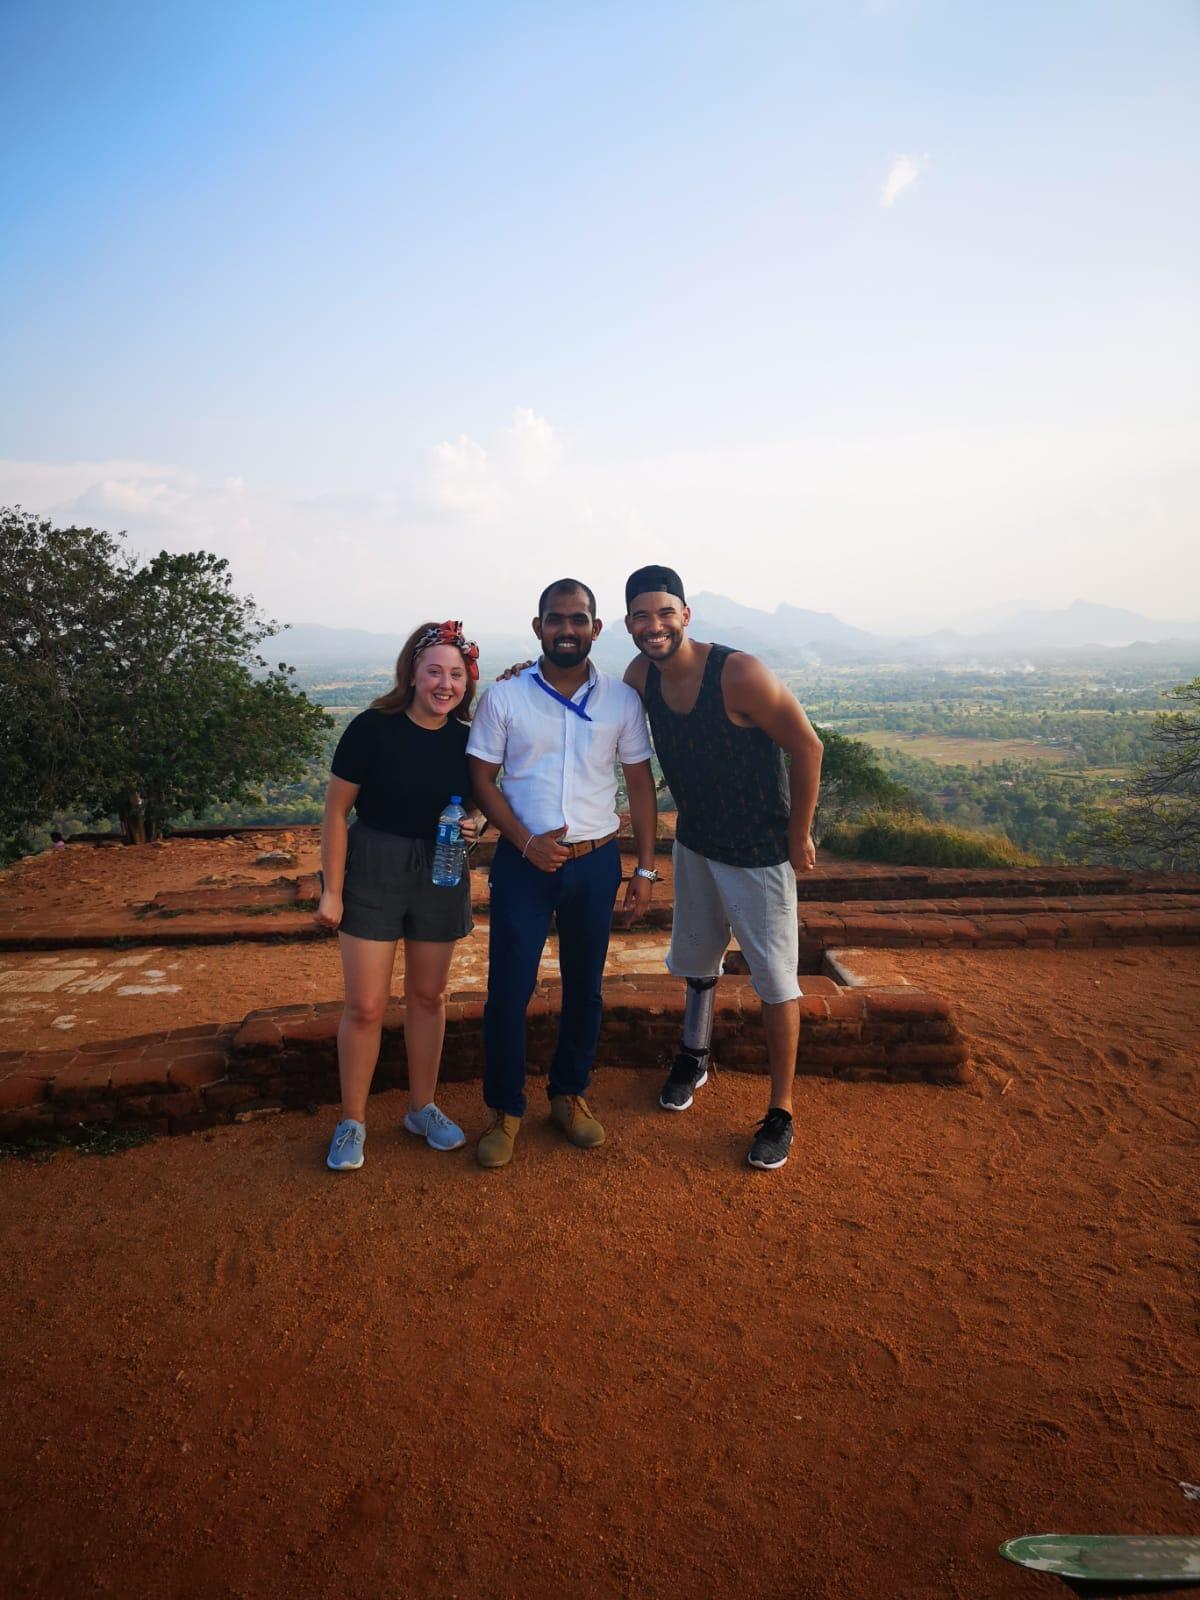 invite-to-paradise-sri-lanka-holiday-honeymoon-specialists-customer-feedback-elin-jordan-luce-chauffeur-guide-ruchira-couple.JPG